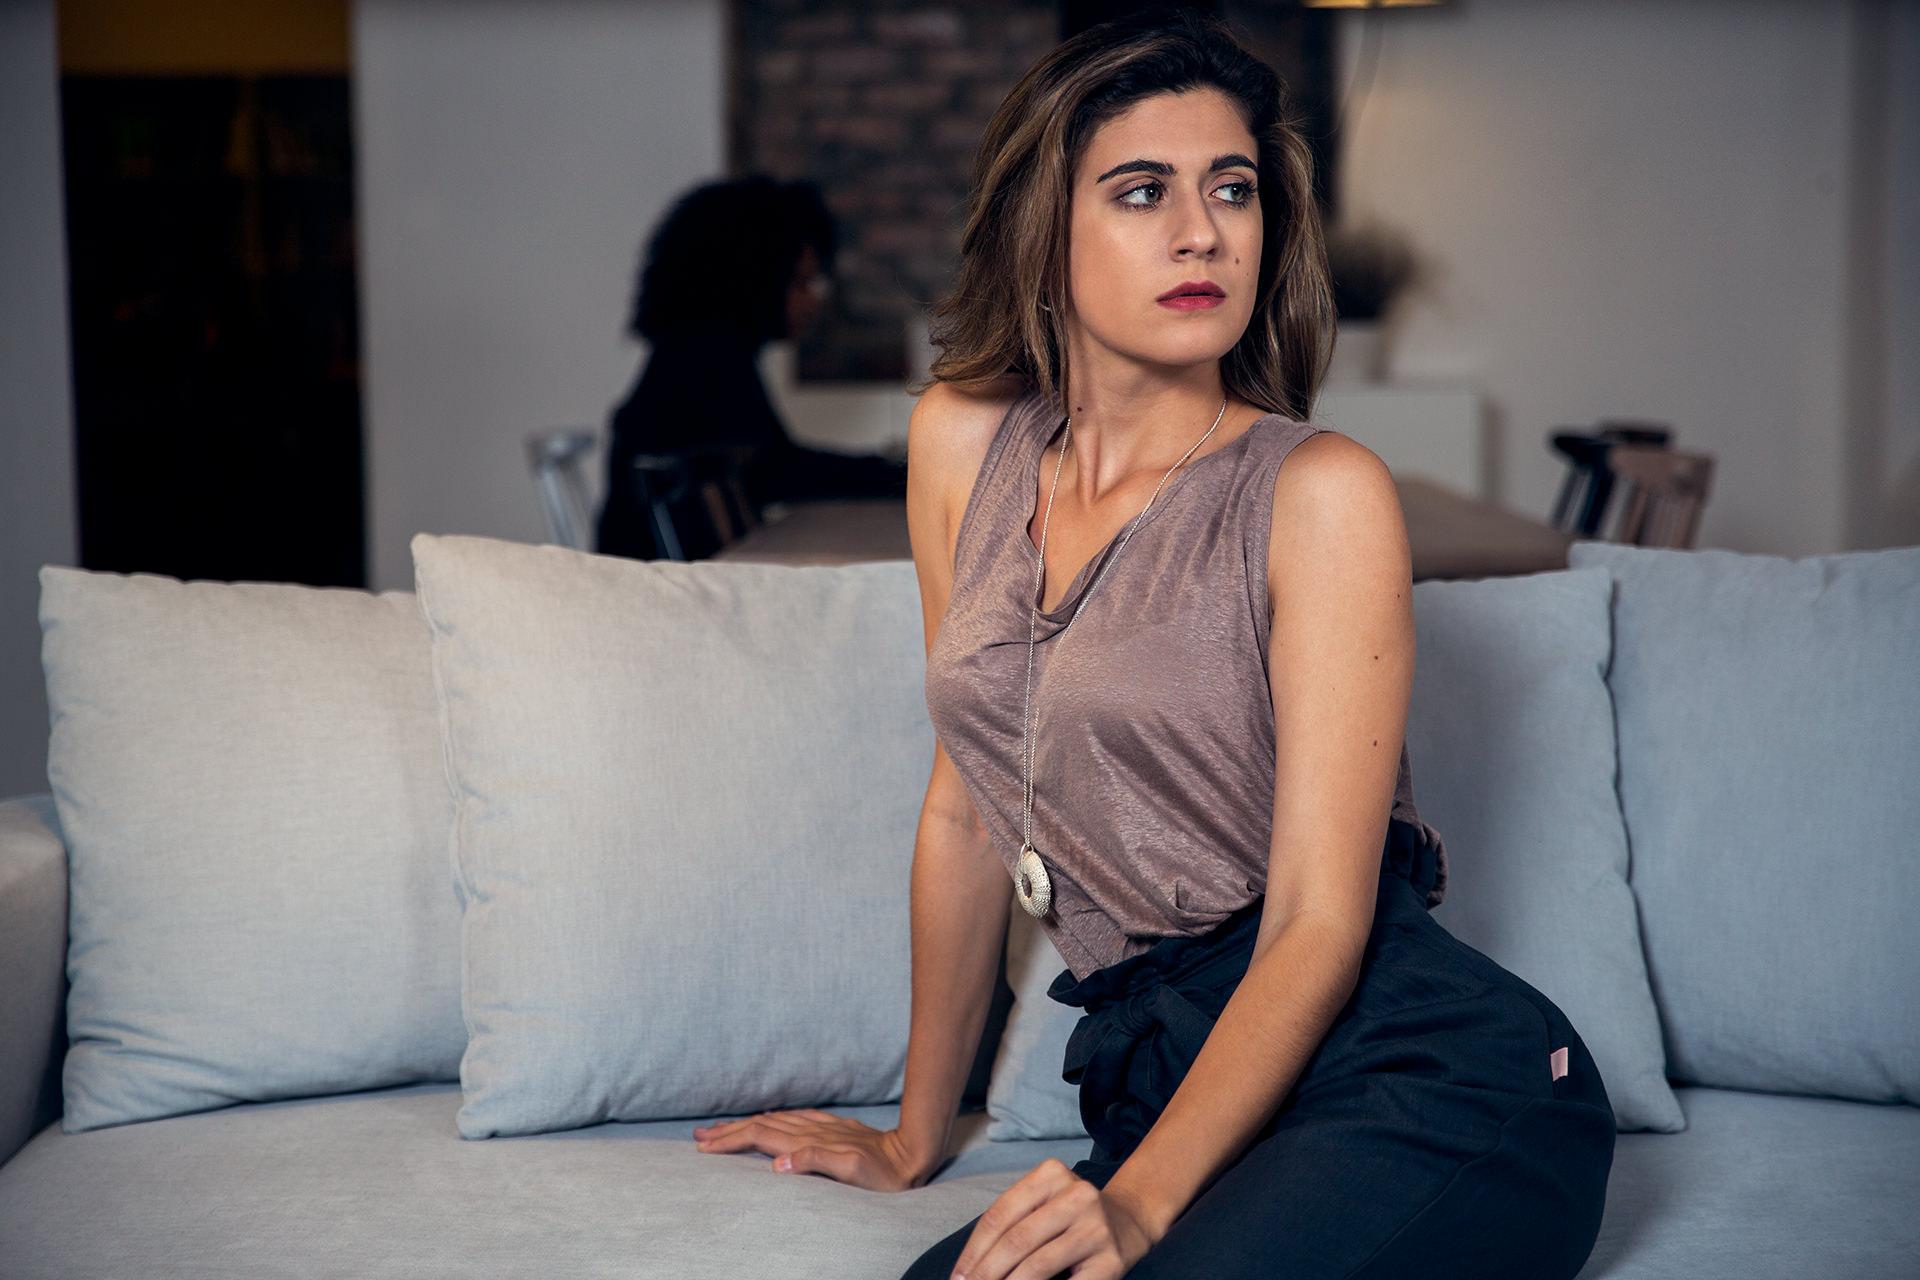 Filipa Santos - Shoot for Näz Fashion in Boa Safra - LX Factory 01 ©Martim Vidigal